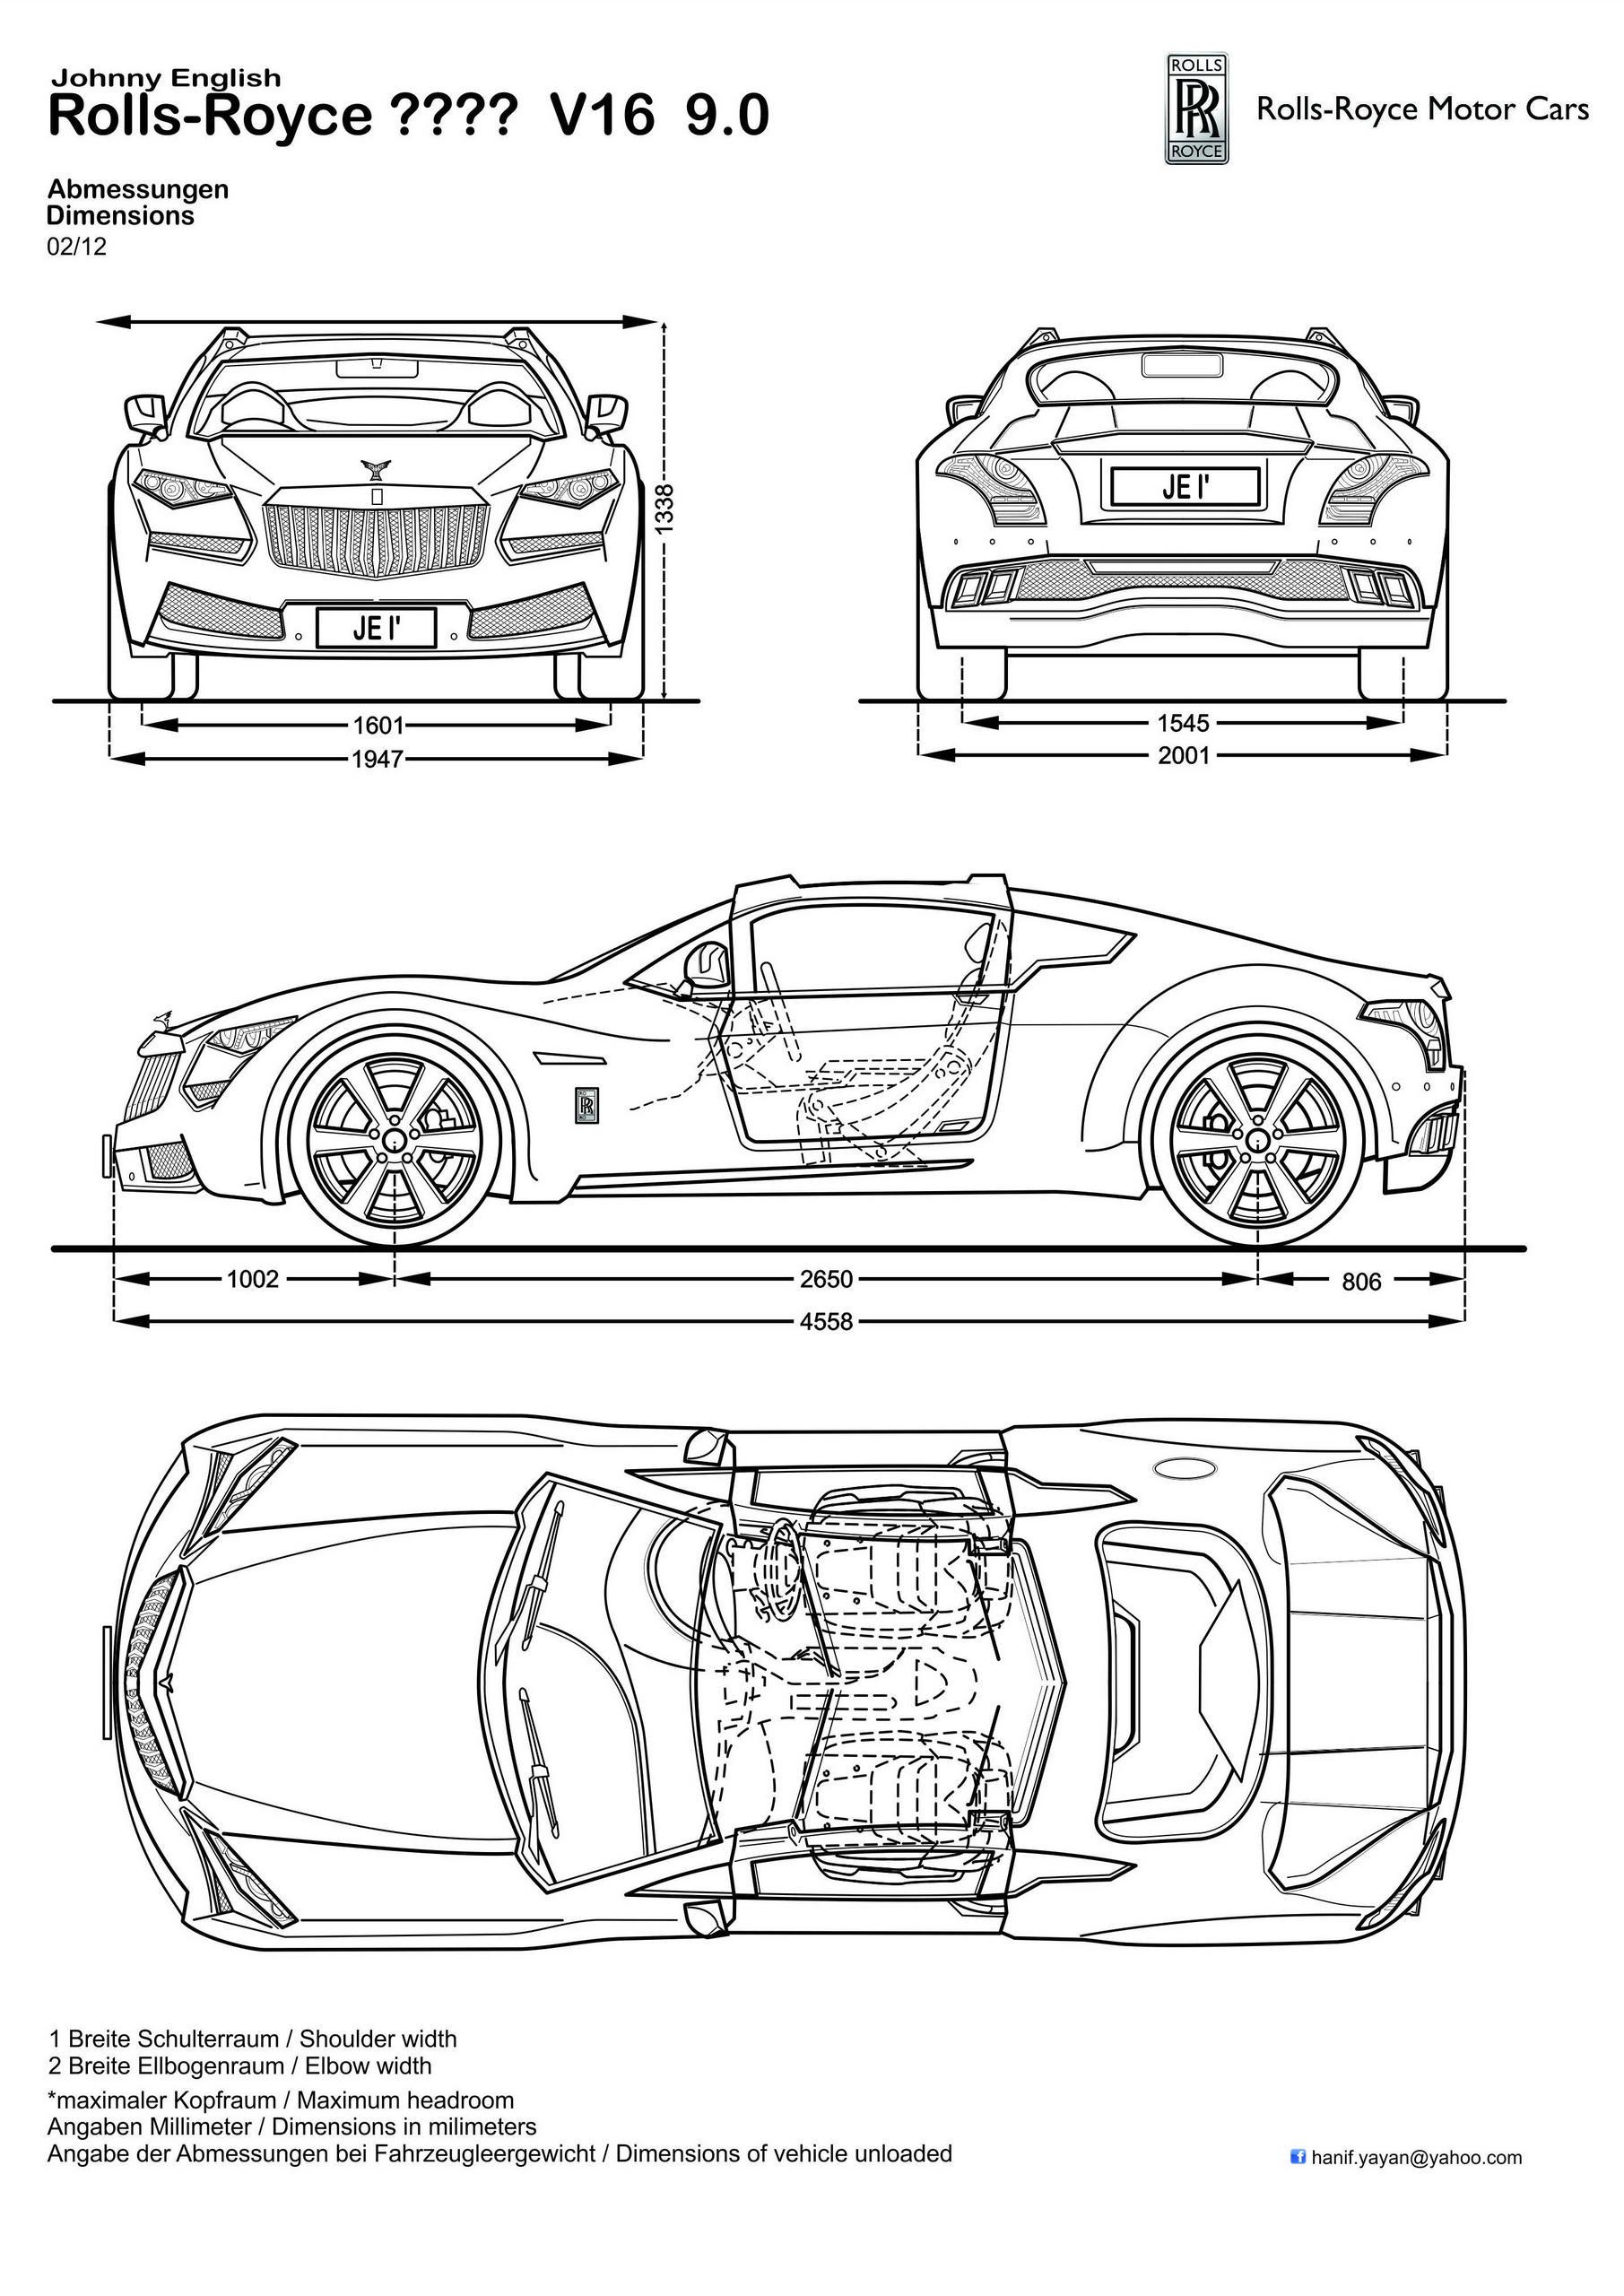 Johnny English Rolls Royce Design Blueprints By Hanif